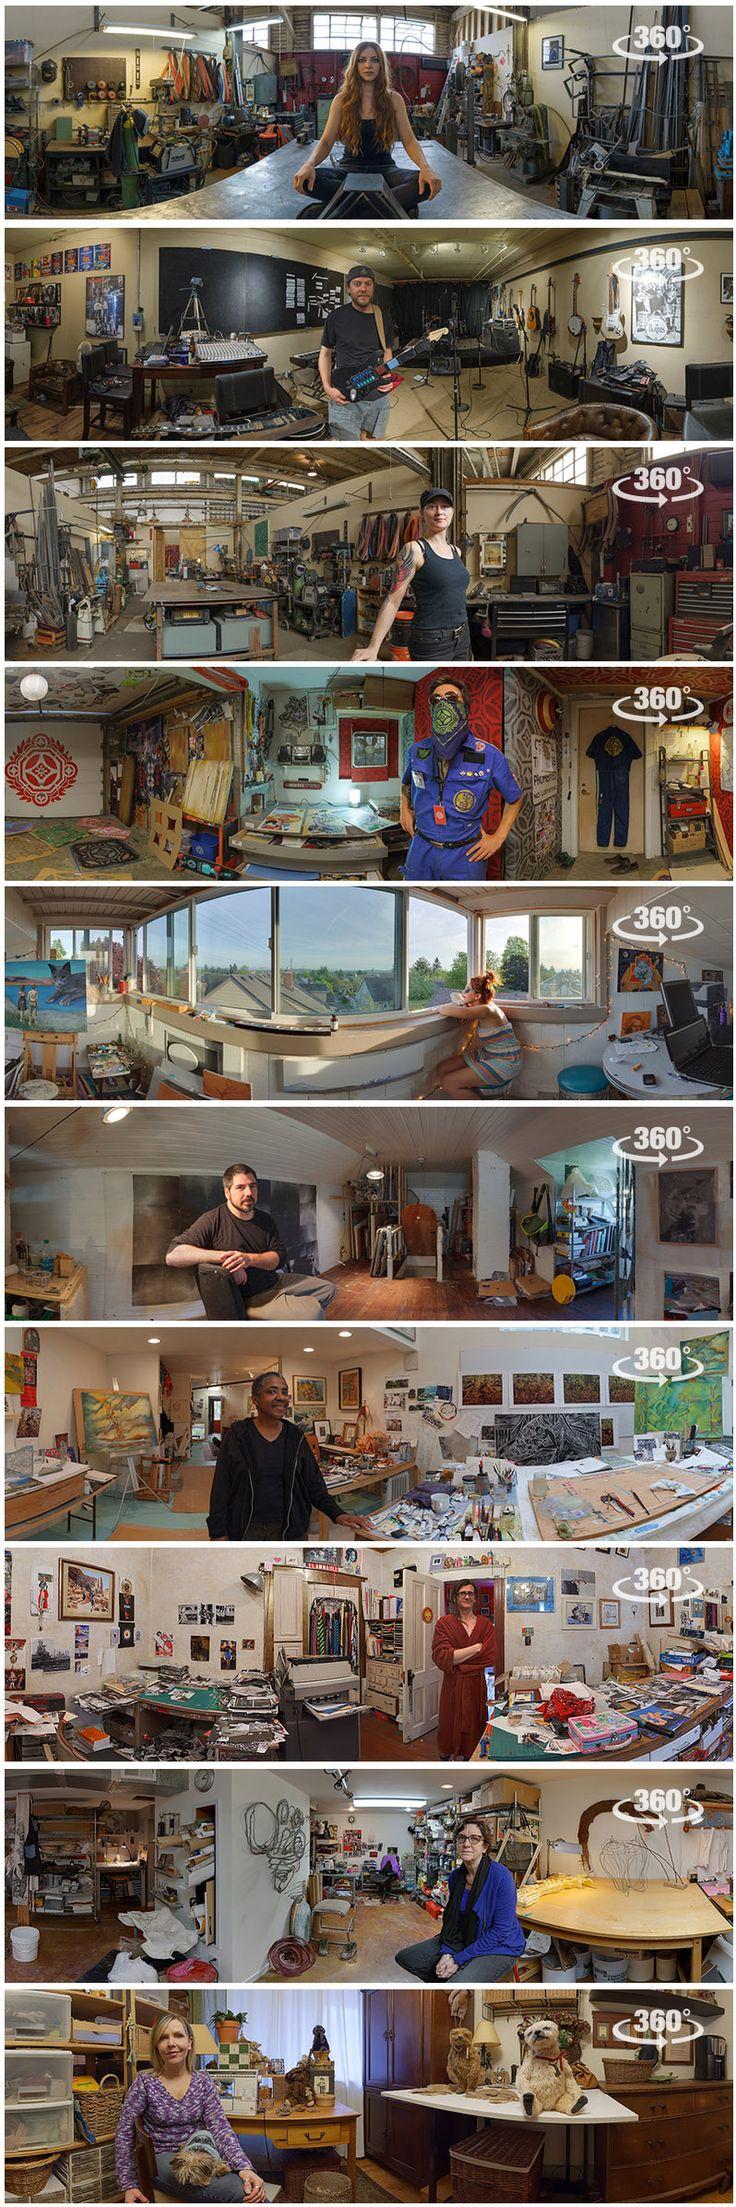 360° Panoramas of Artists in their Studios - Bohonus VR photography       http://www.bohonus.com/category/artists-studios/